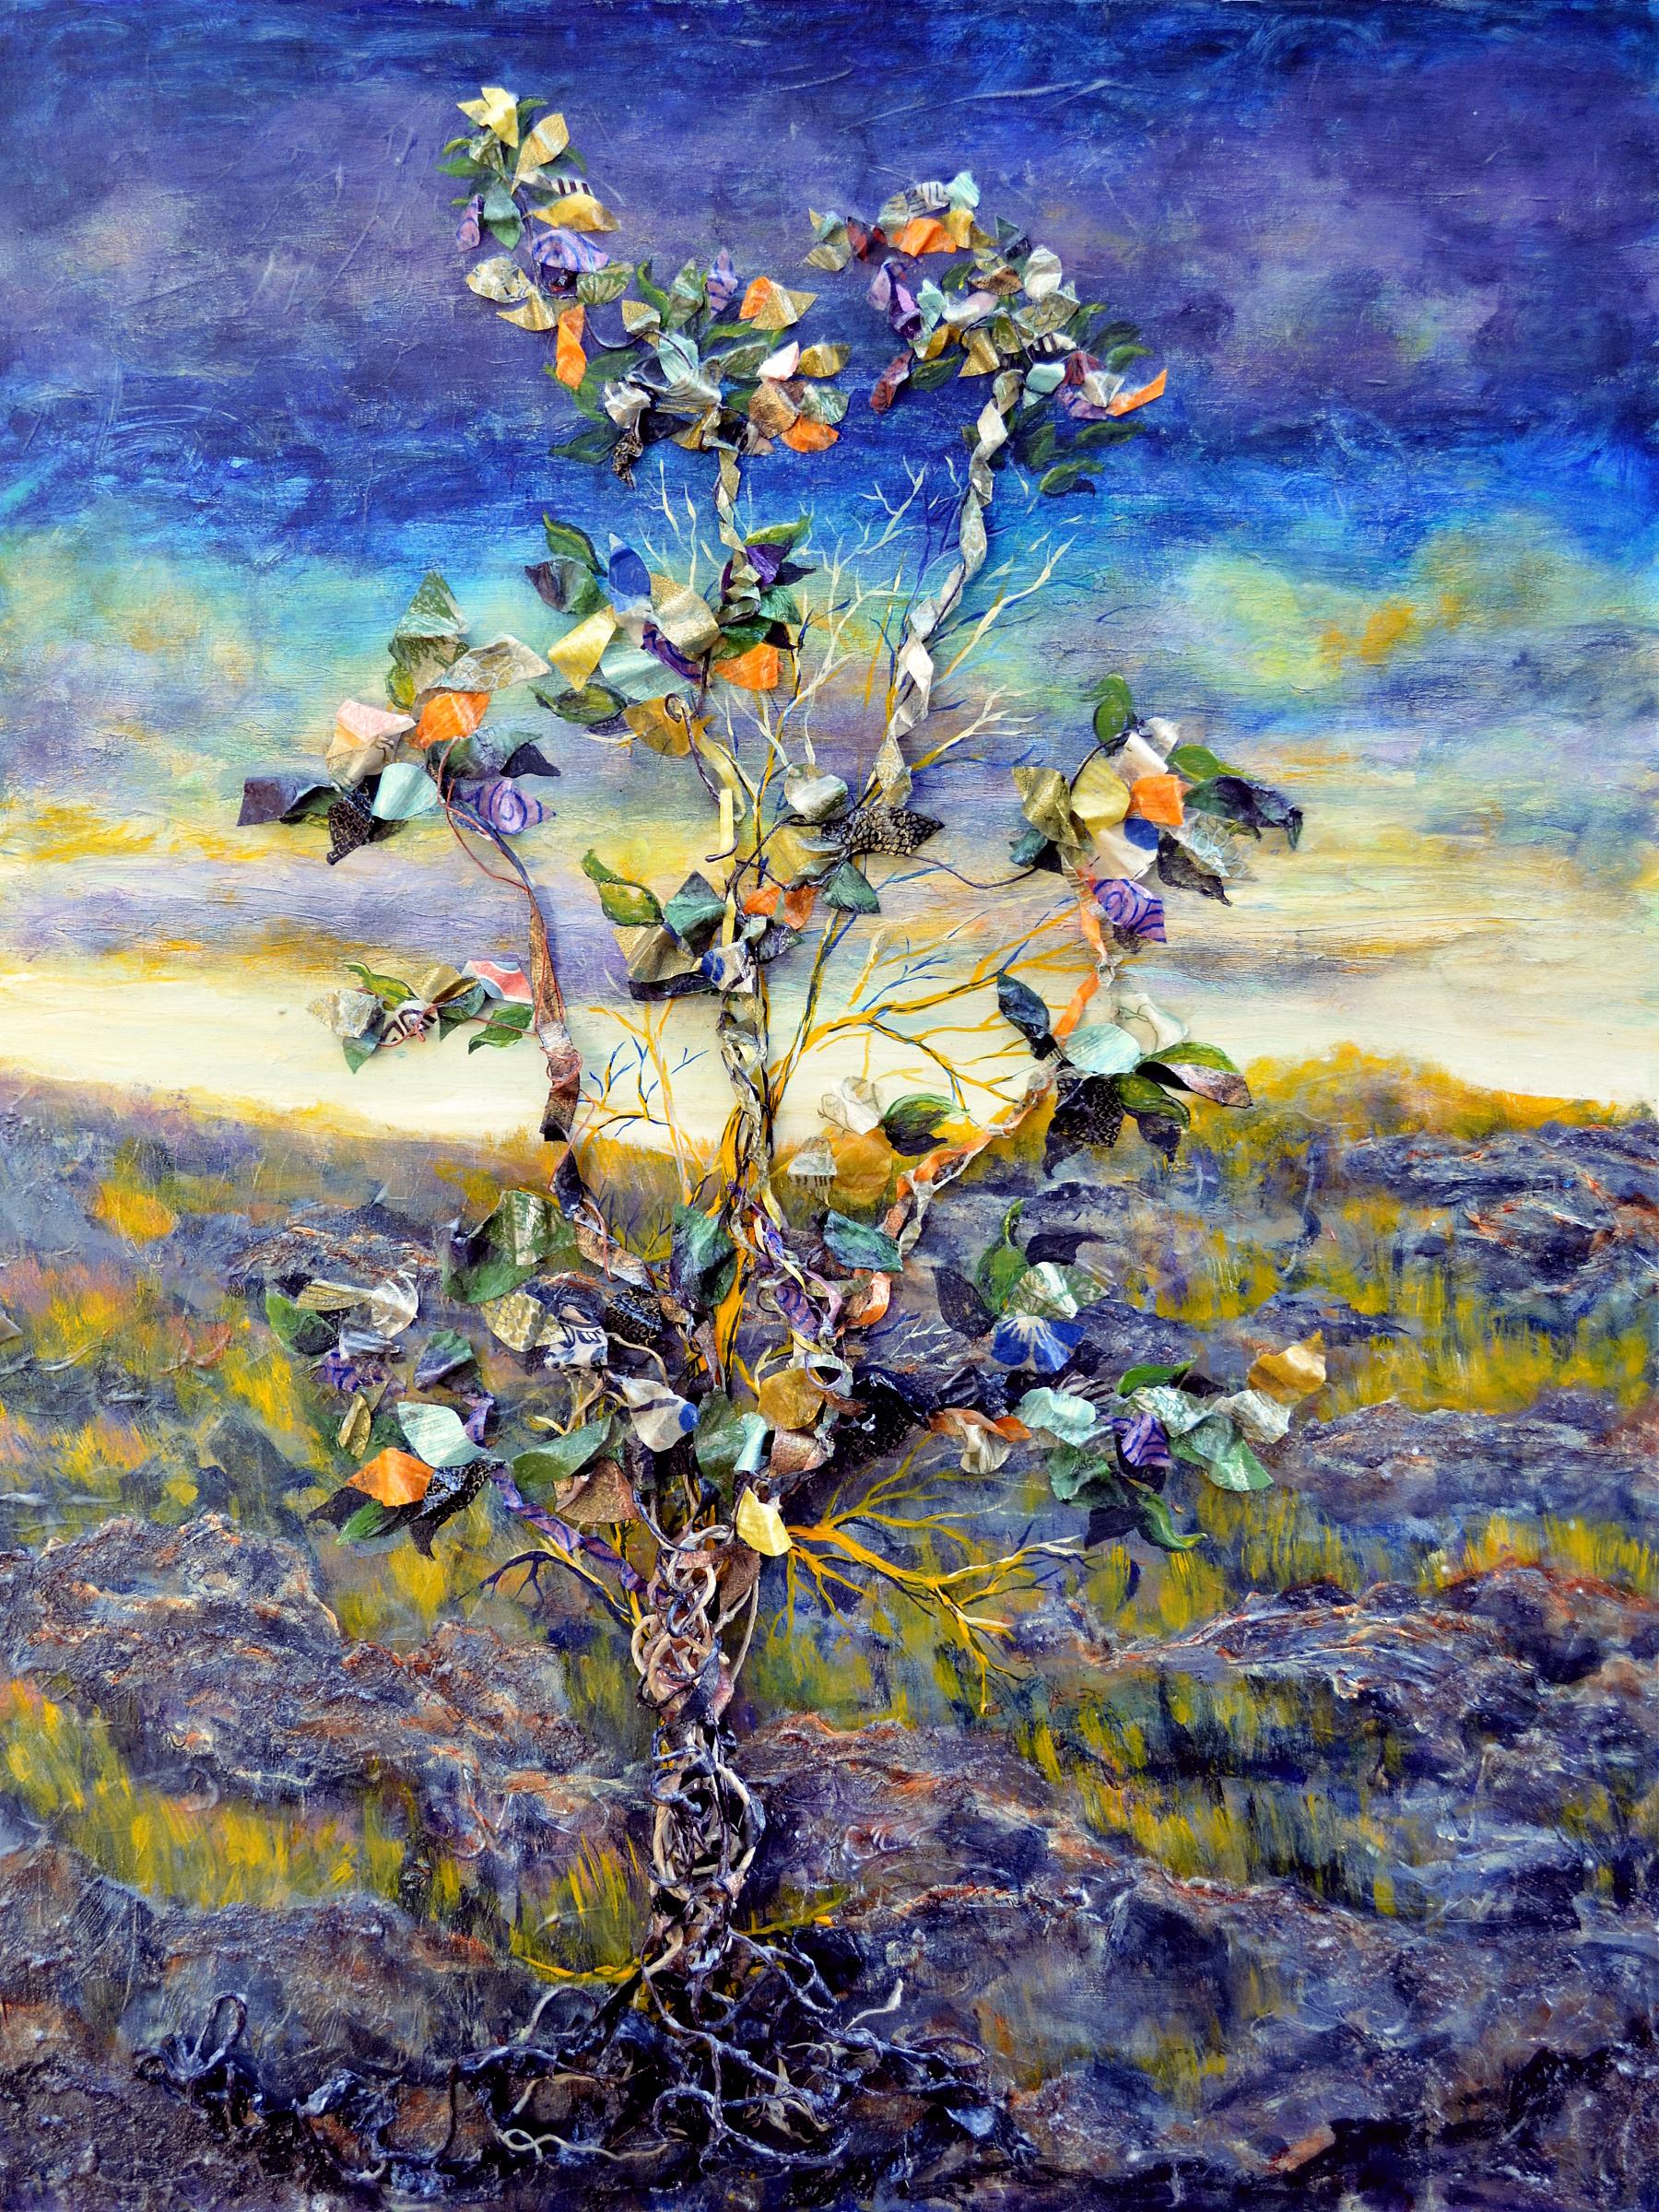 Hope artwork by Regina Valluzzi - art listed for sale on Artplode